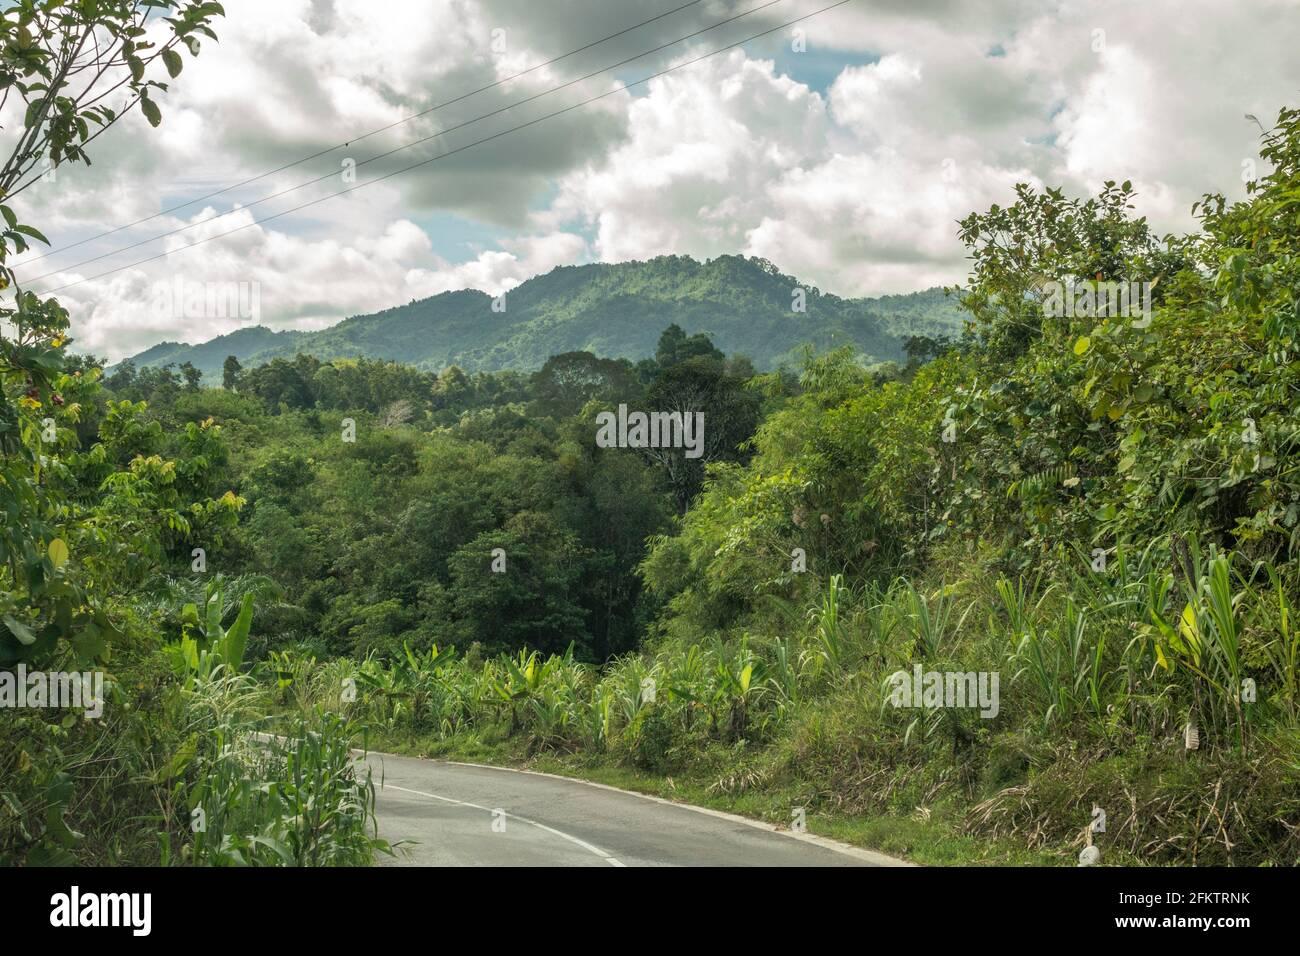 Kampung Semaru road, Padawan, Sarawak, East Malaysia Stock Photo